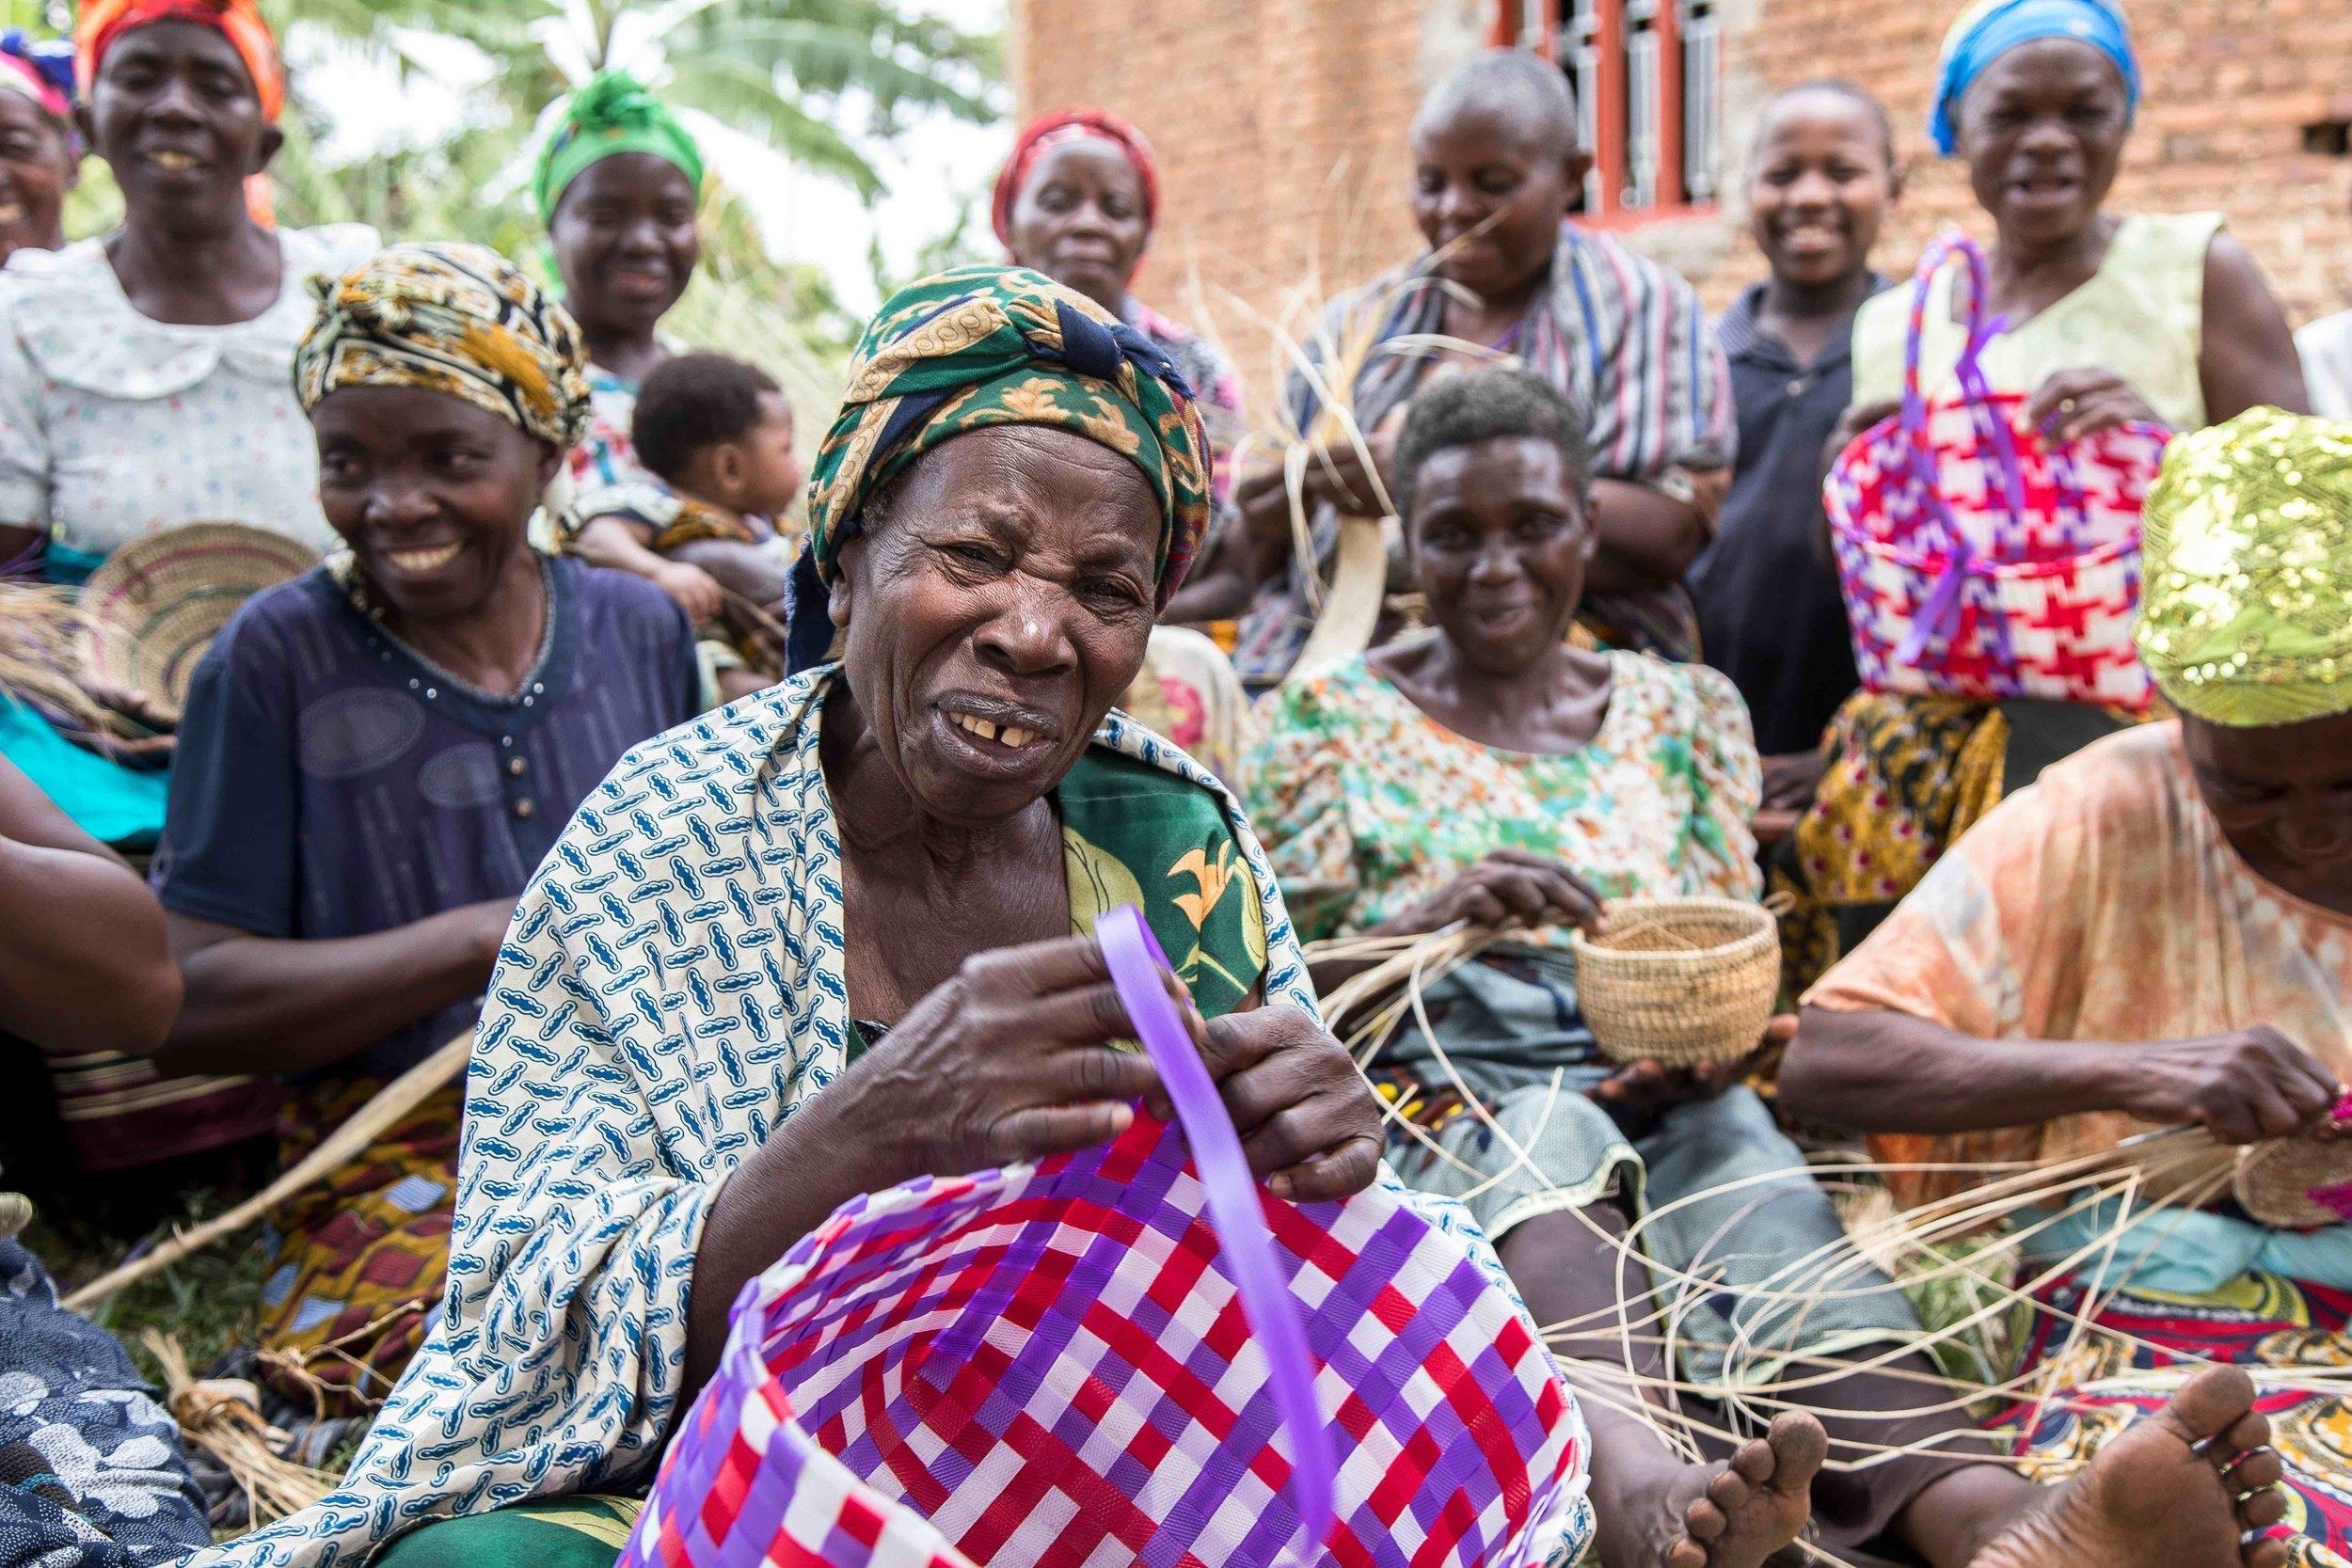 Adam Dickens 2017 - Deki Uganda - Kamasasa Cell - Handcrafts 12.jpg